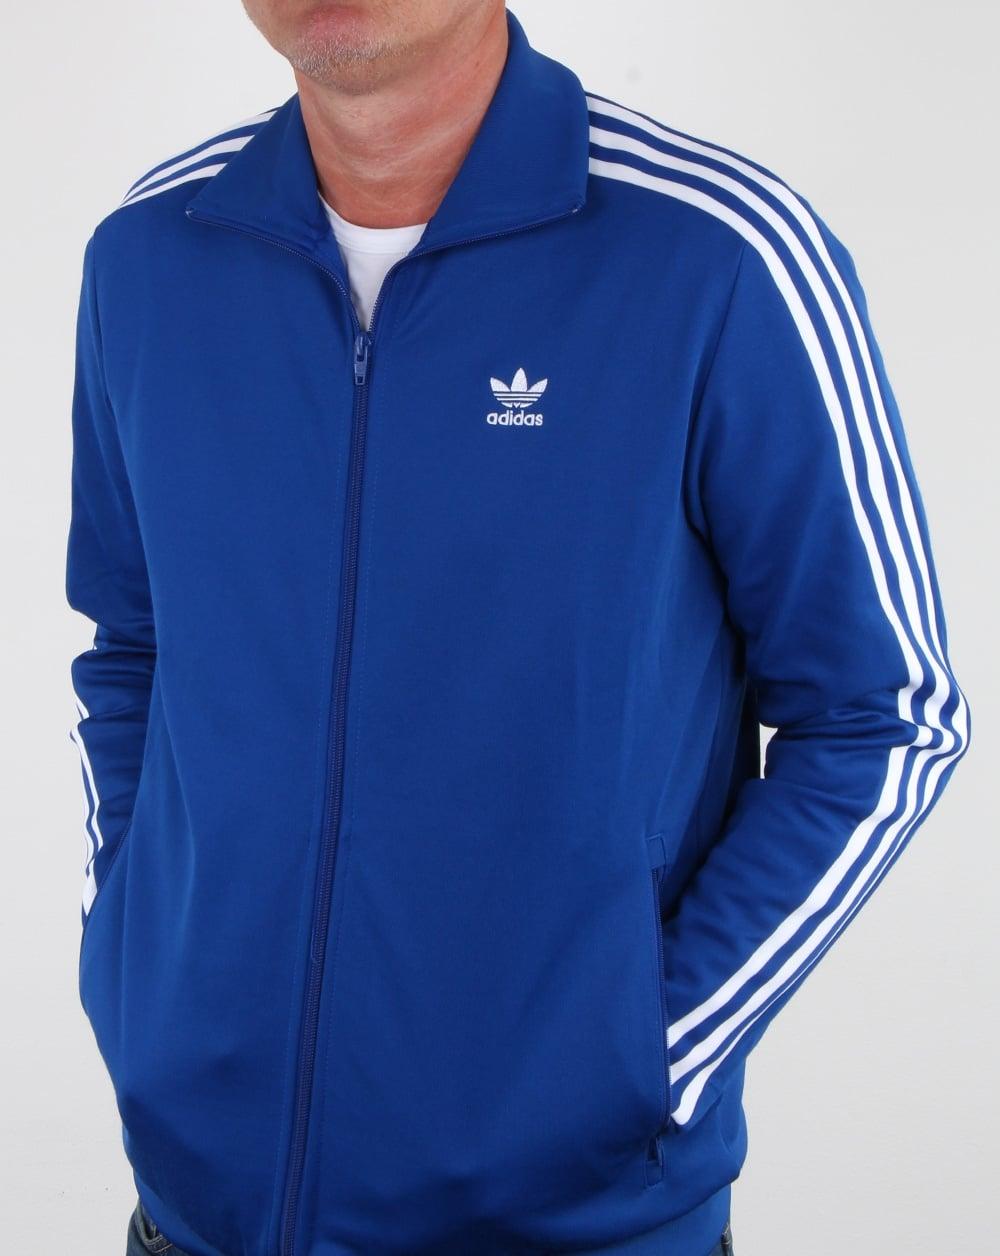 Adidas Originals Beckenbauer Track Top Collegiate Royal